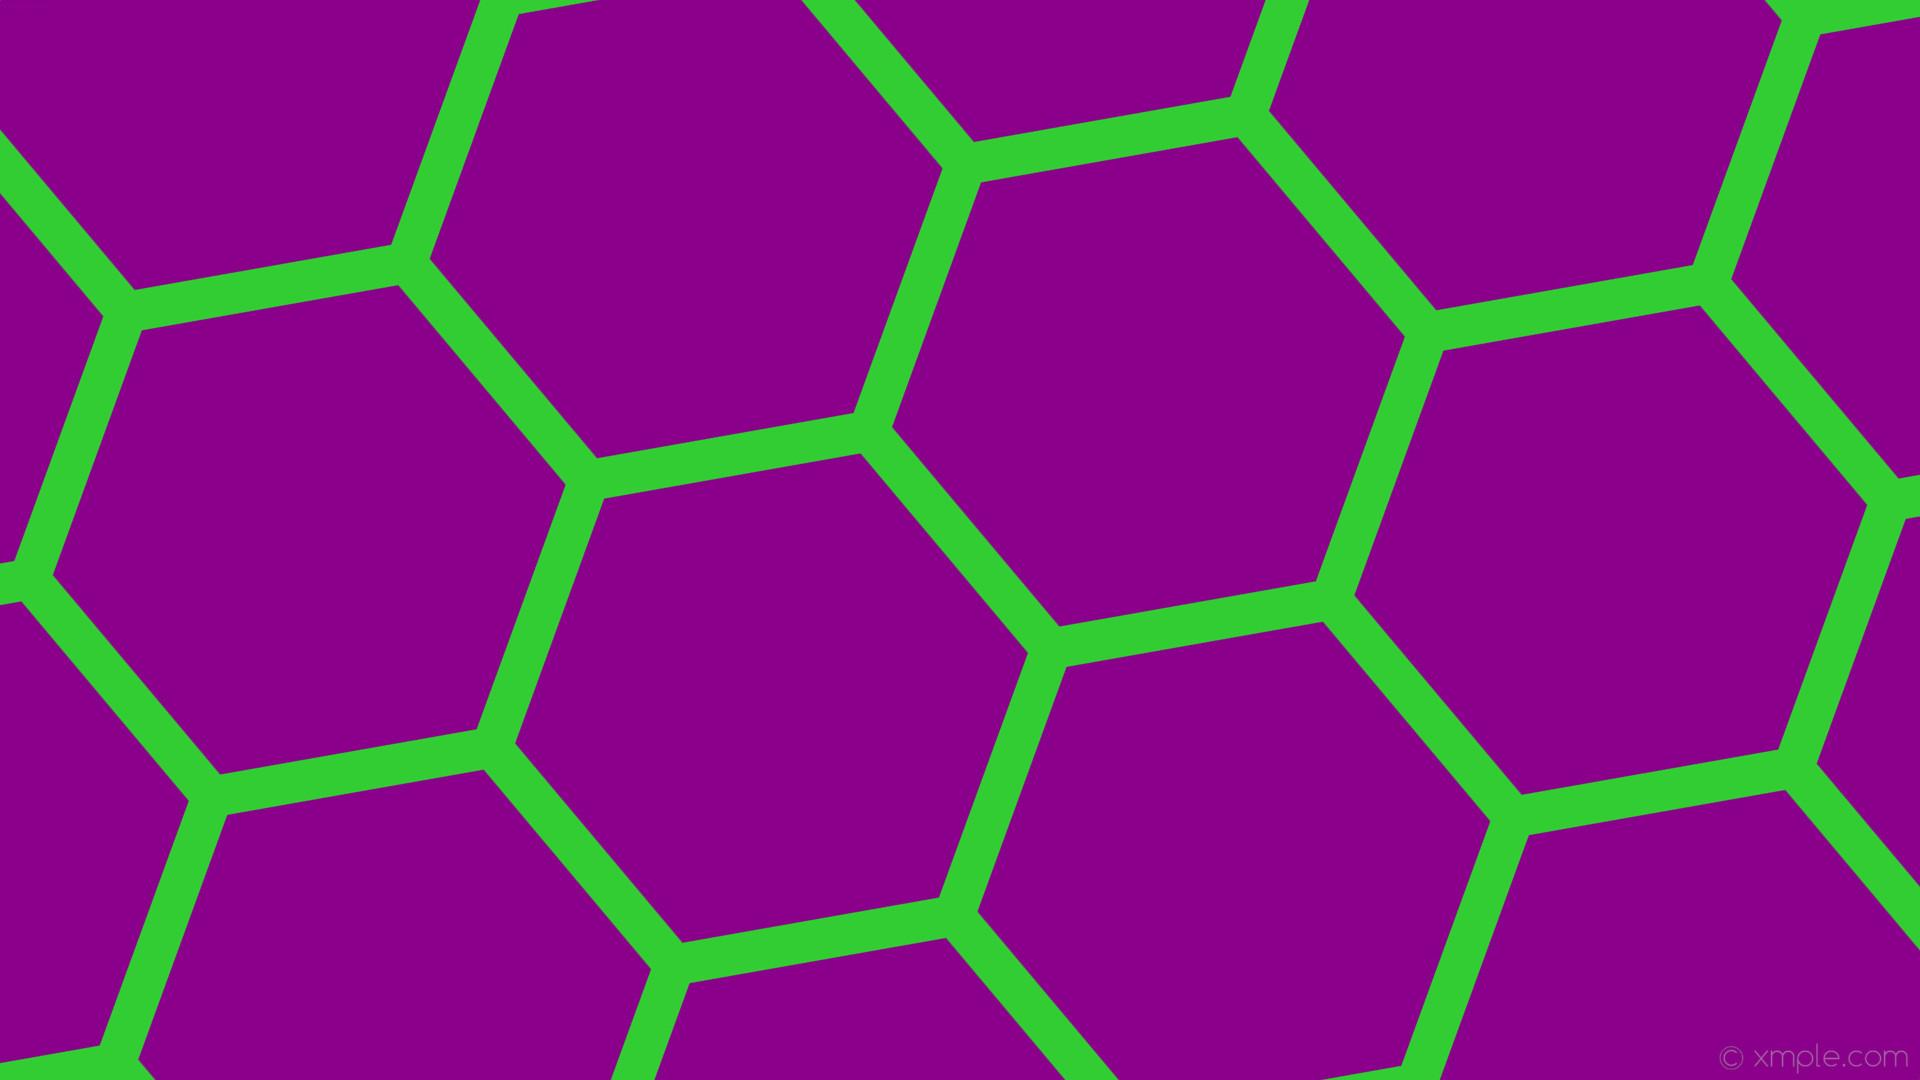 wallpaper purple hexagon beehive honeycomb green dark magenta lime green  #8b008b #32cd32 diagonal 40